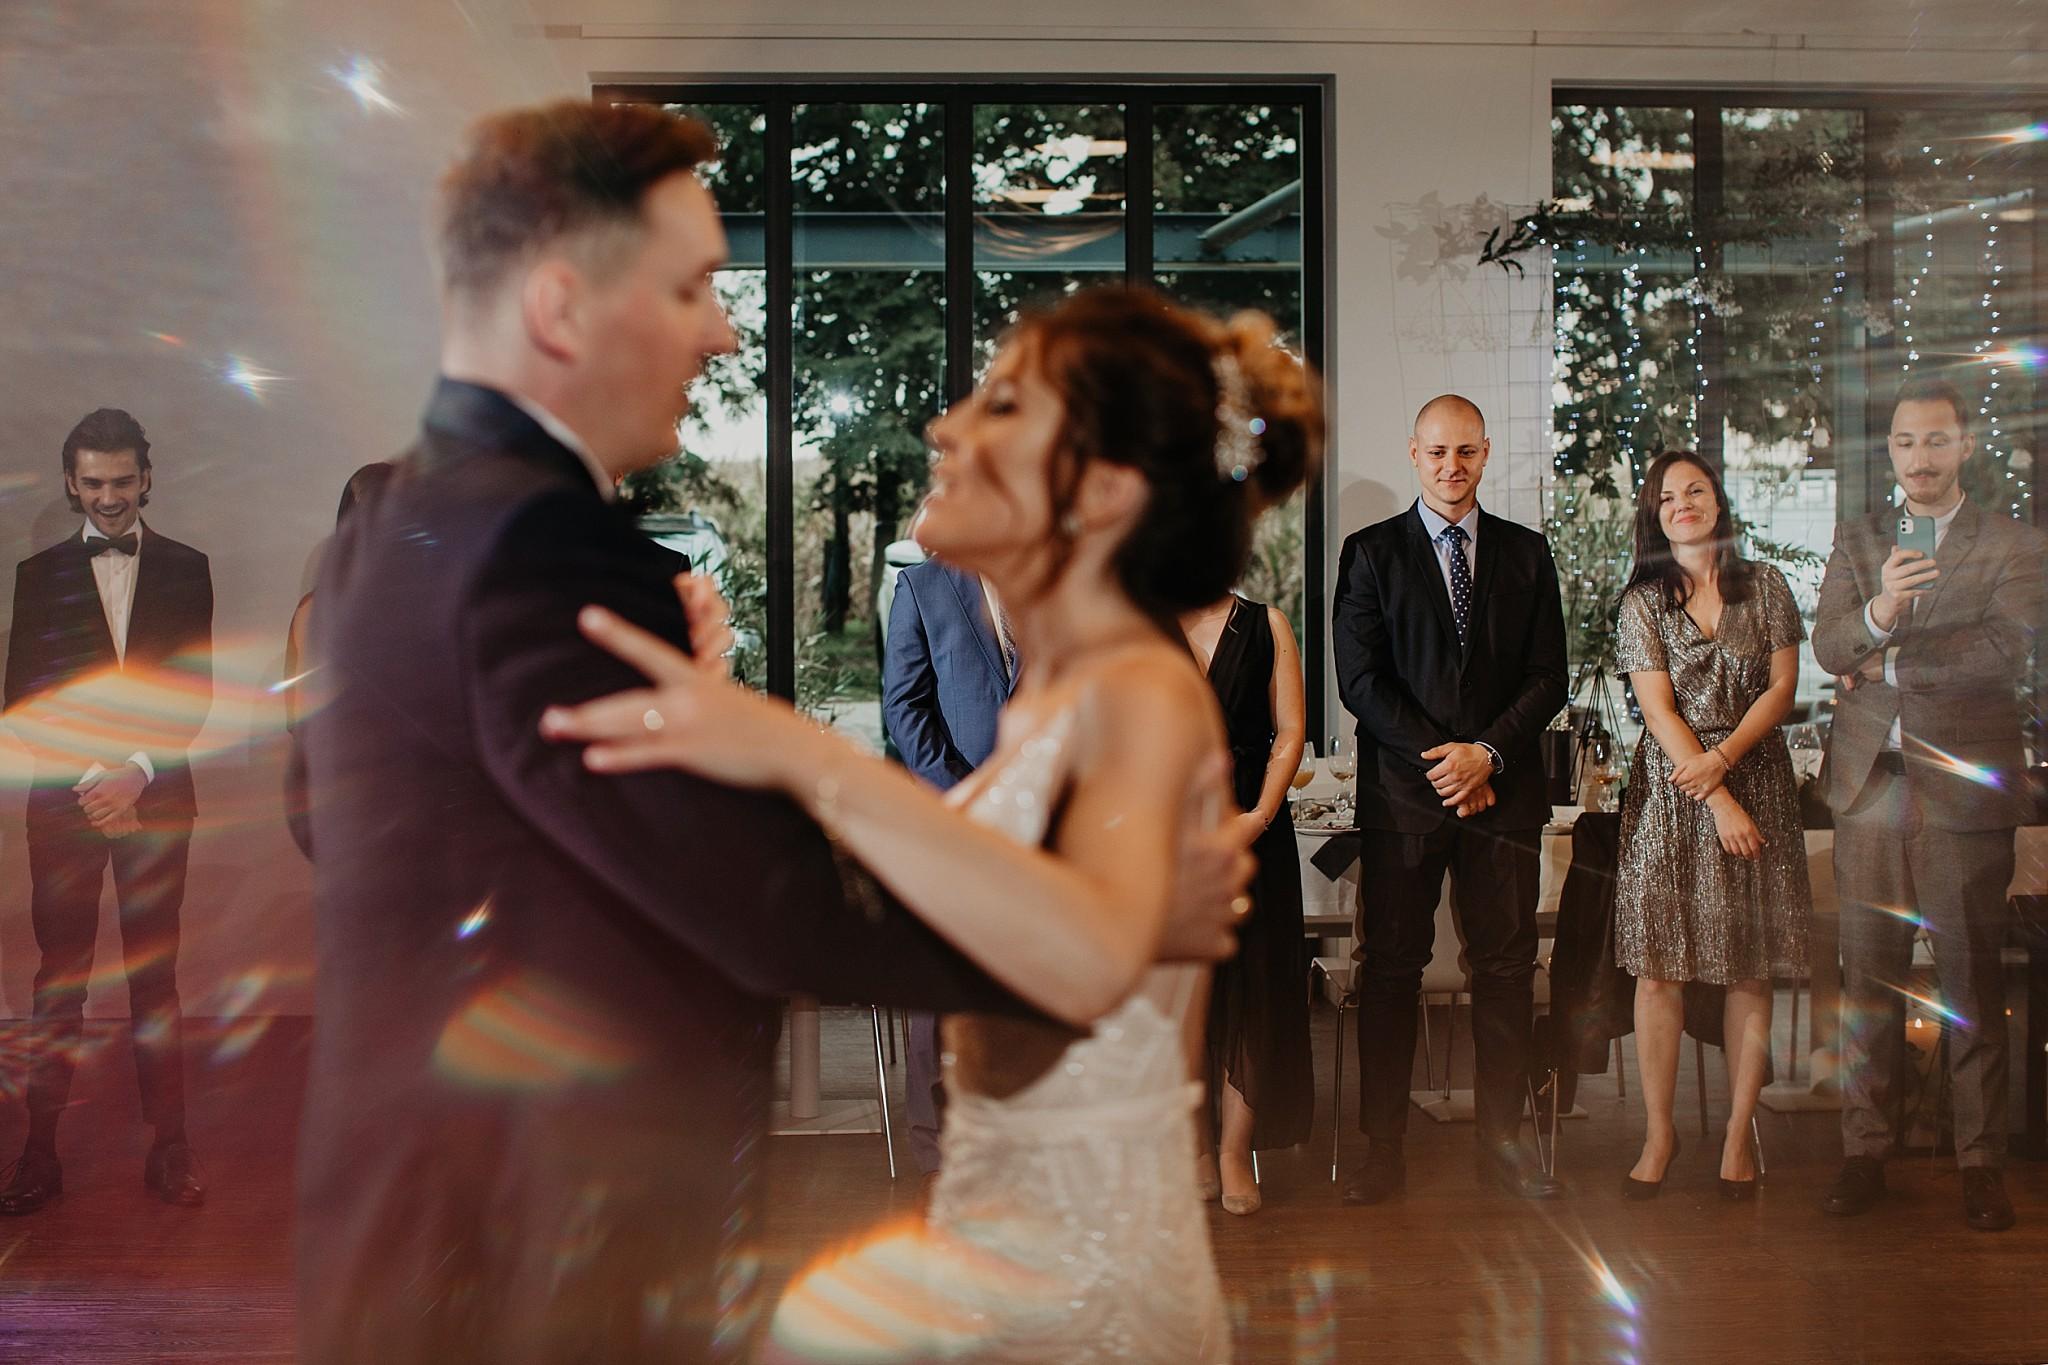 fotograf poznan wesele dobra truskawka piekne wesele pod poznaniem wesele w dobrej truskawce piekna para mloda slub marzen slub koronawirus slub listopad wesele koronawirus 308